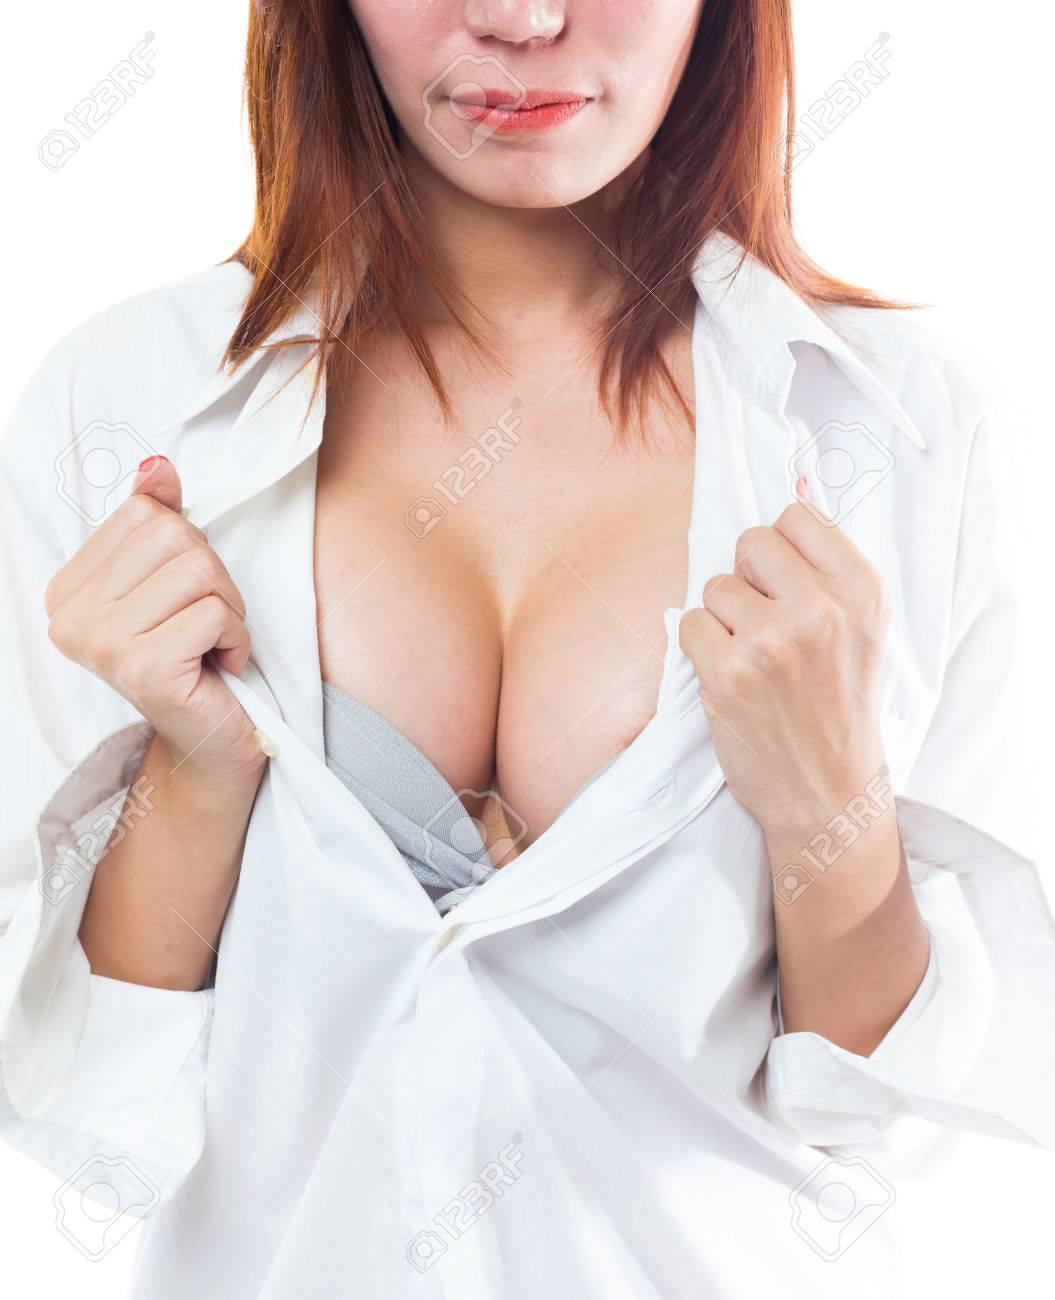 Hot niger school girls pussy